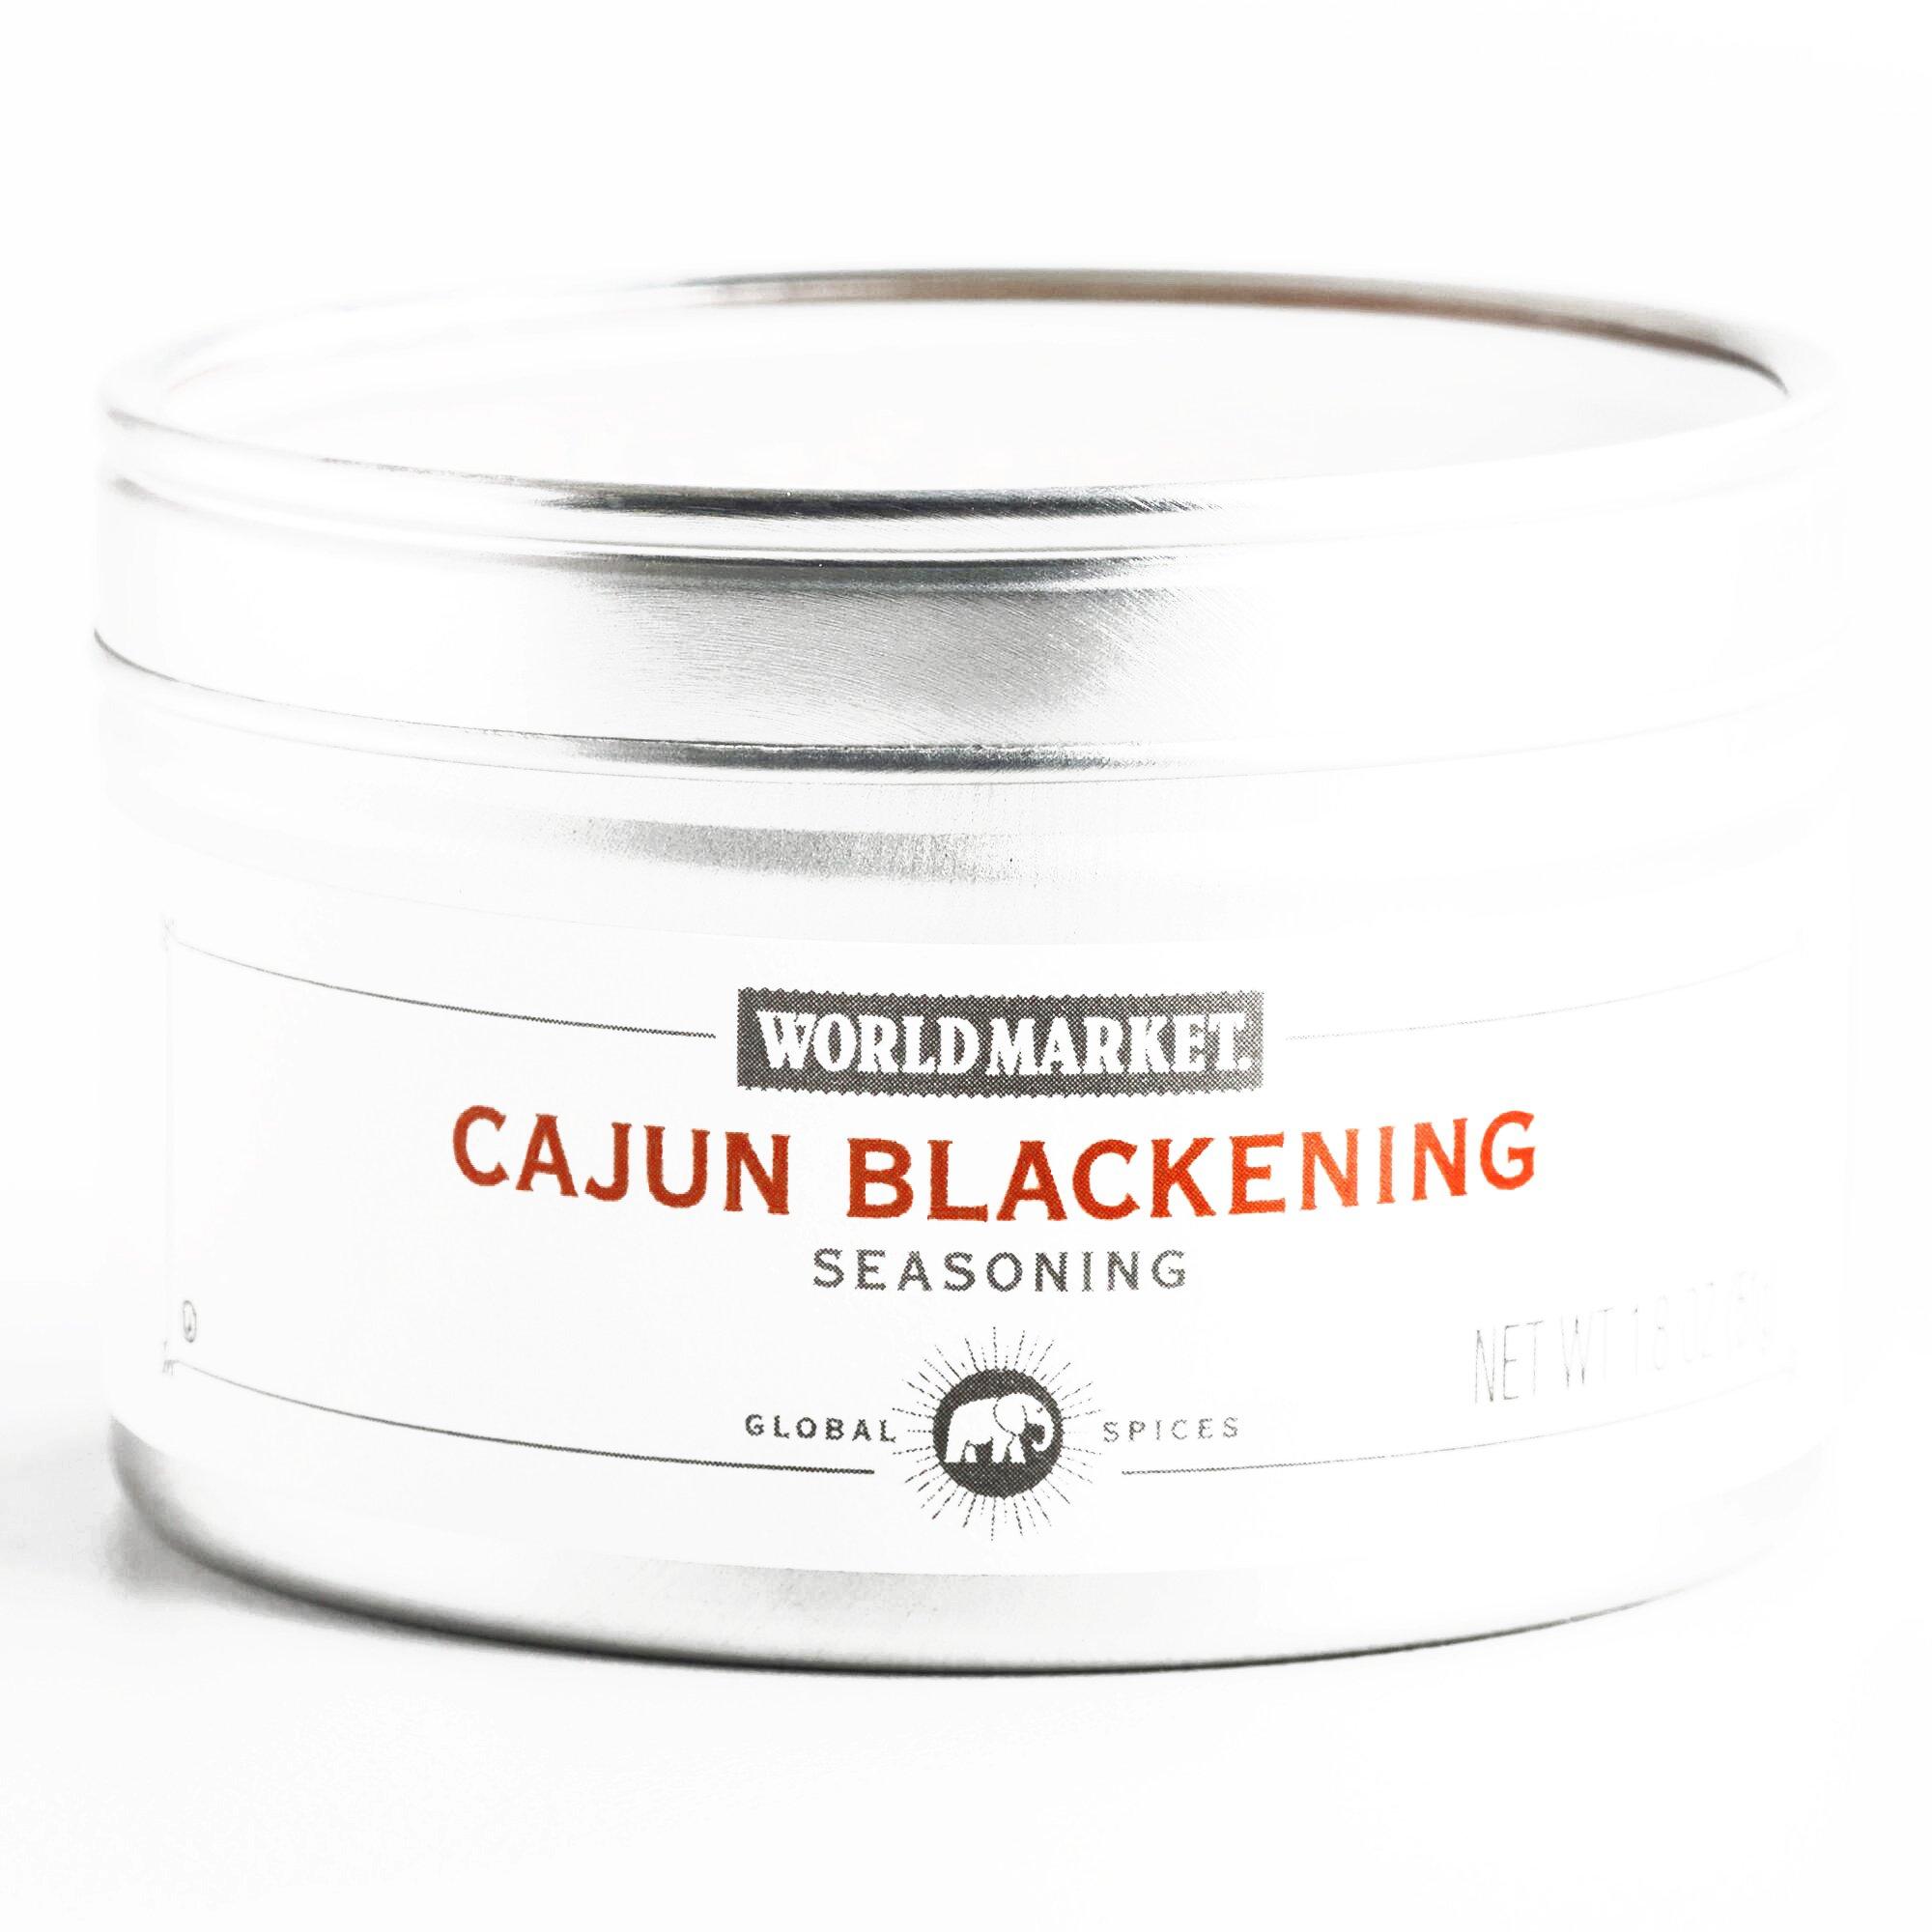 Cajun Blackening Seasoning 1.8 oz each (3 Items Per Order, not per case)